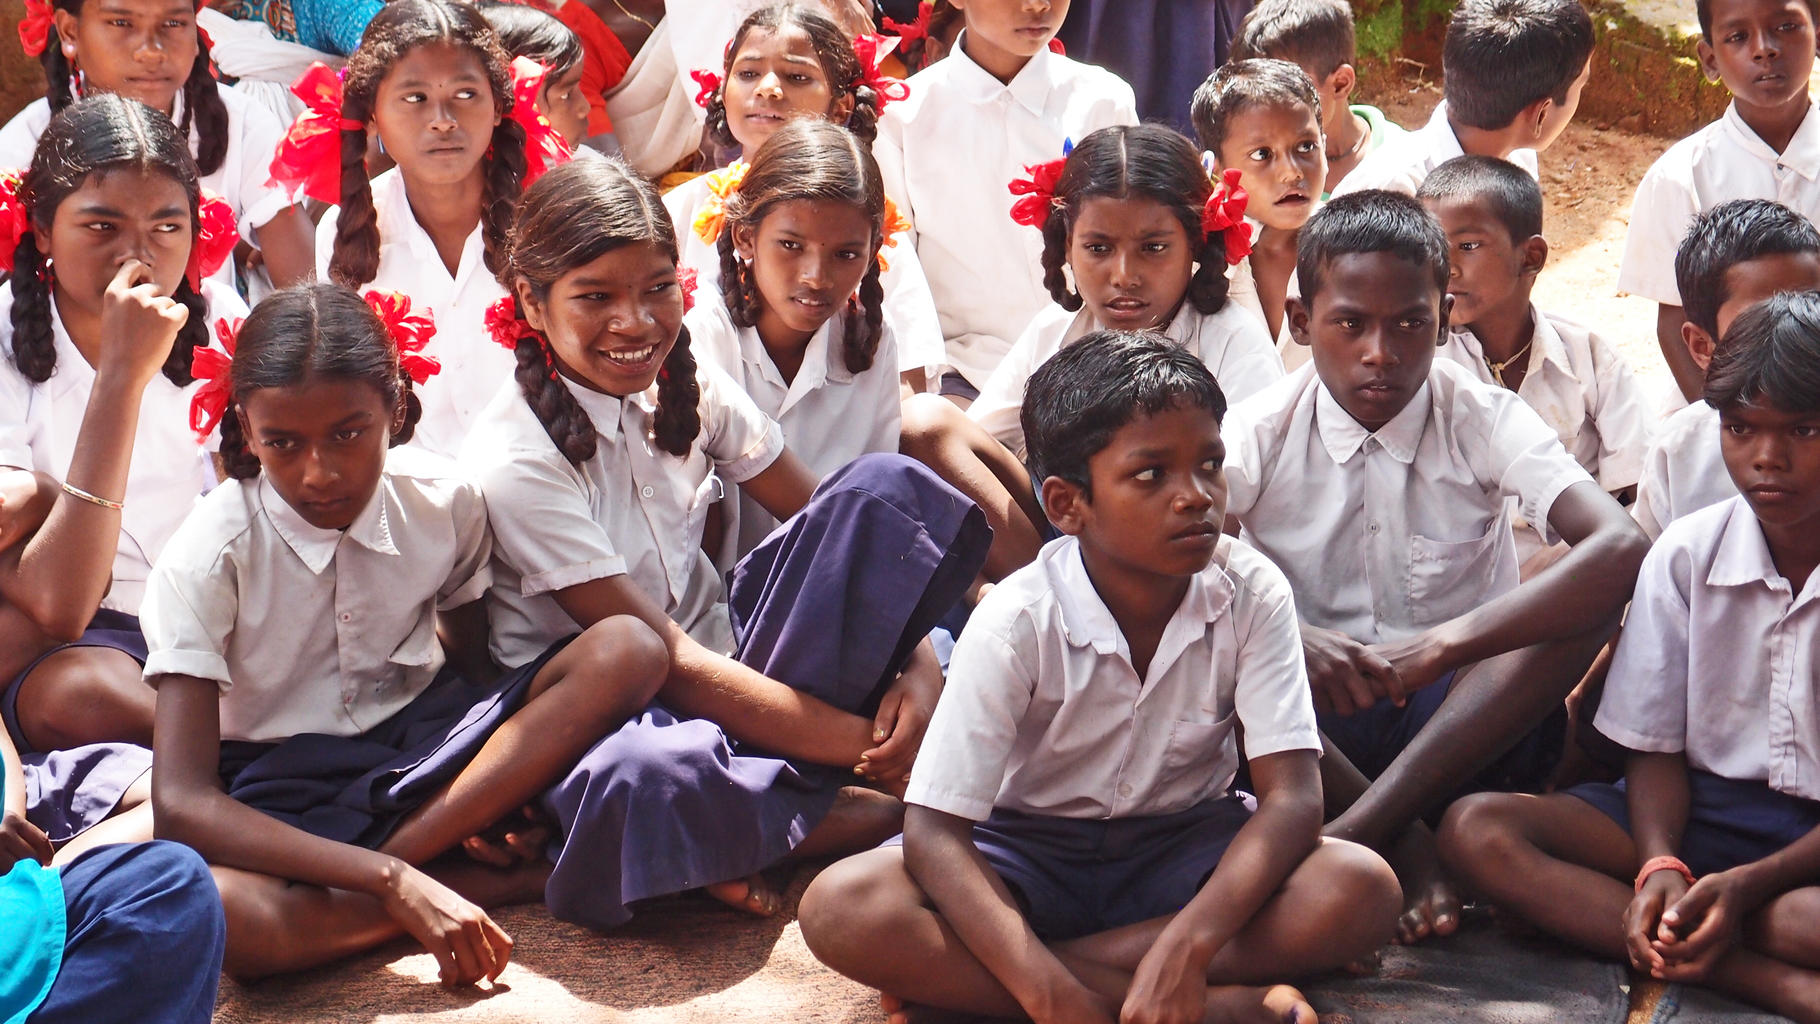 Schüler/innen sitzen auf dem Boden